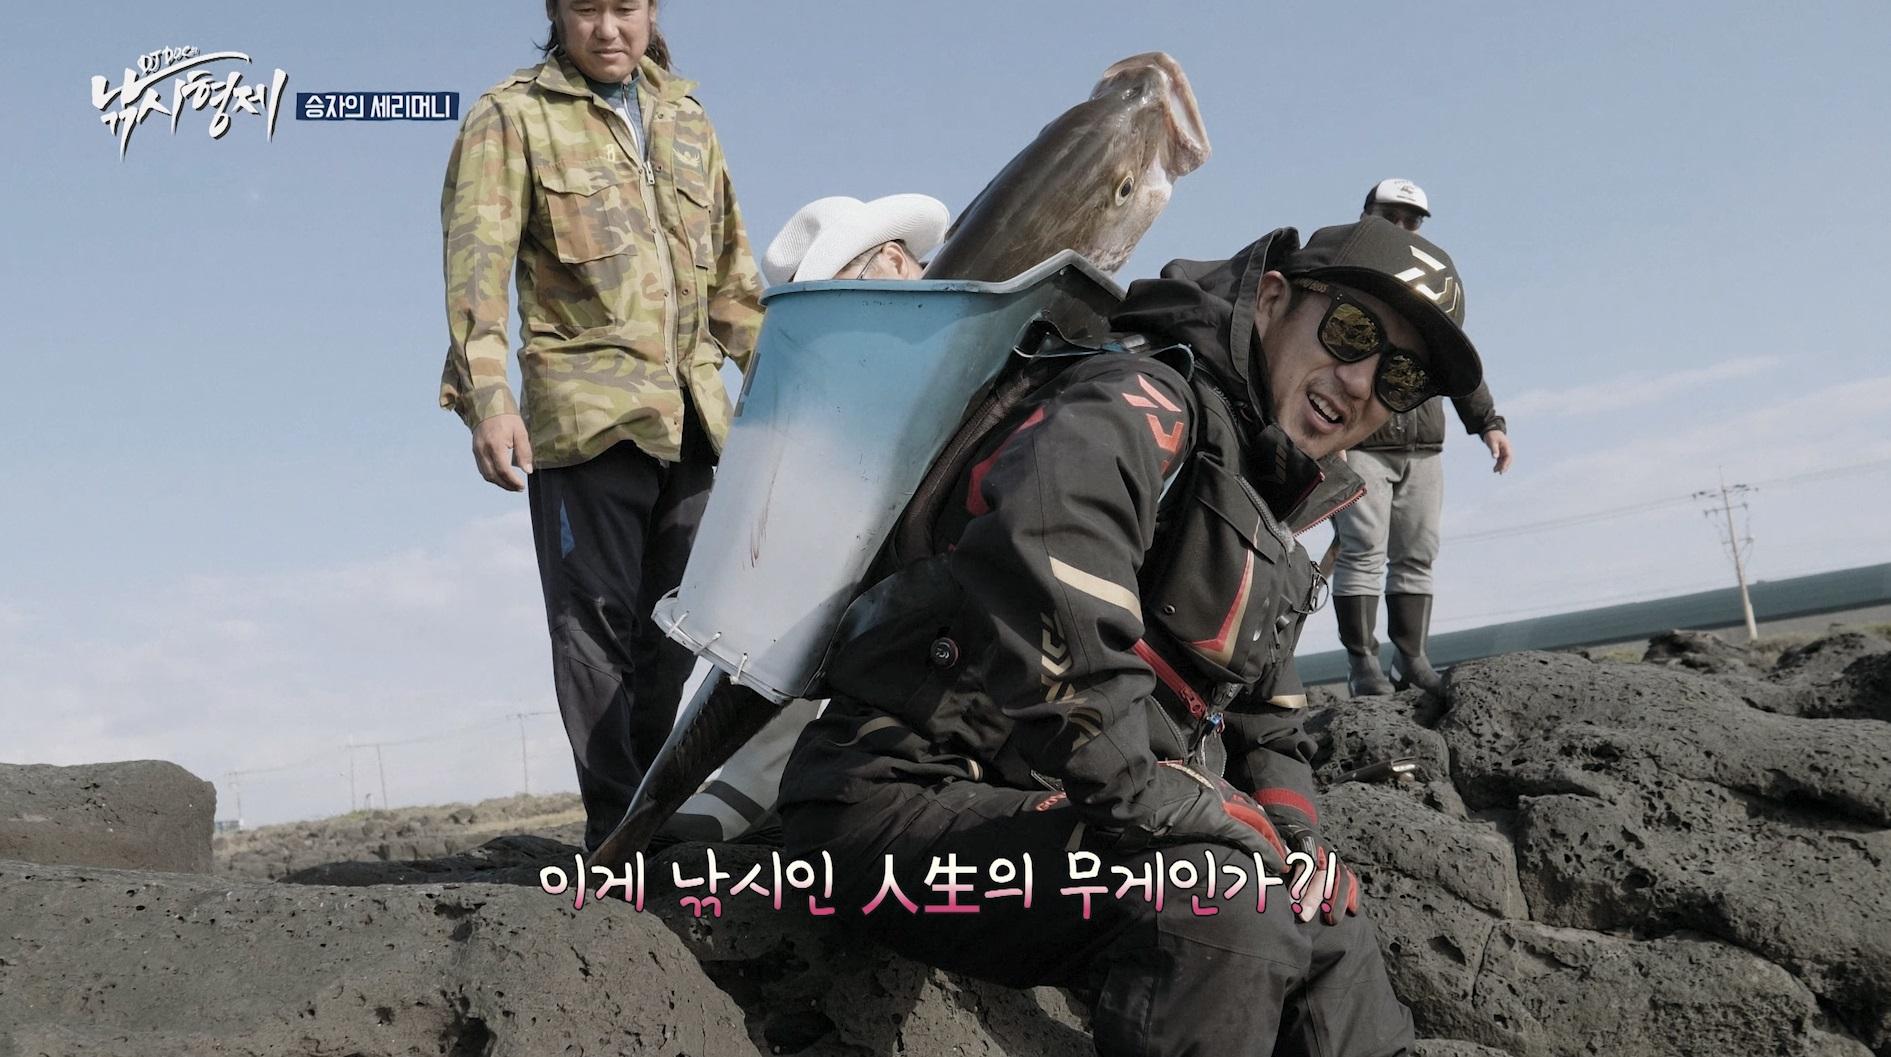 'DJ DOC의 낚시형제' 이하늘, 제주도서 갯바위 대물낚시로 125cm 대형 잿방어 낚아